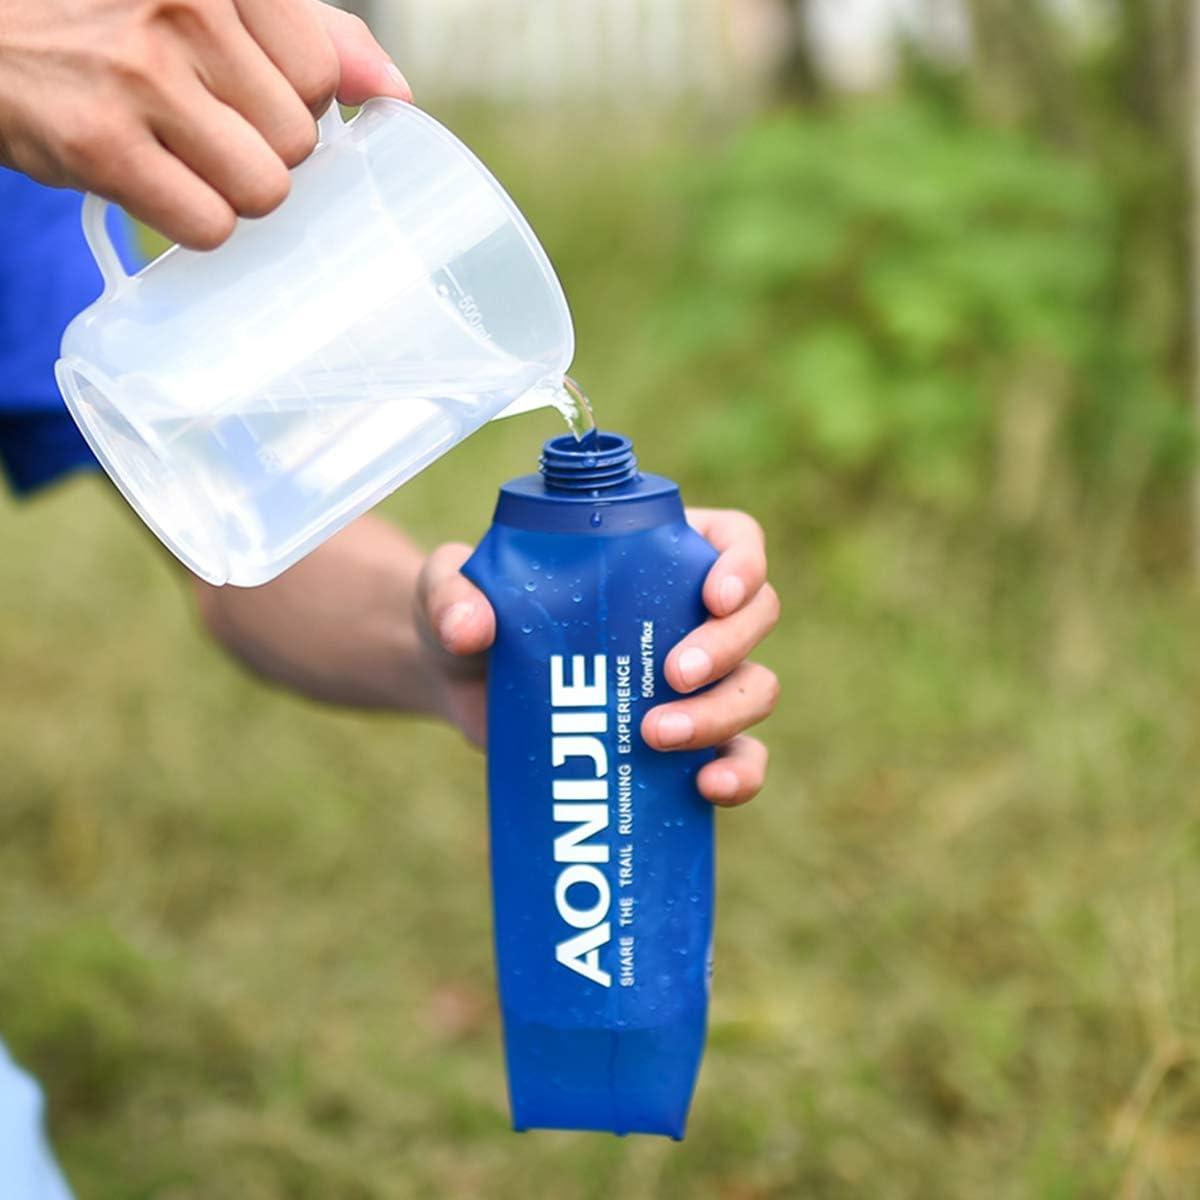 AONIJIE 250ml Folding Bottle, hiking, camping, outdoor, adventure, activity, portable, lightweight, bpa free, pvc free, Aonijie, Aonijie Malaysia, Aonijie Folding Bottle, Aonijie Hydration Bladder, Aonijie Running Foldable Water Bottle, bottle, sport bottle, squeeze bottle, water bottle malaysia, collapsible water bottle